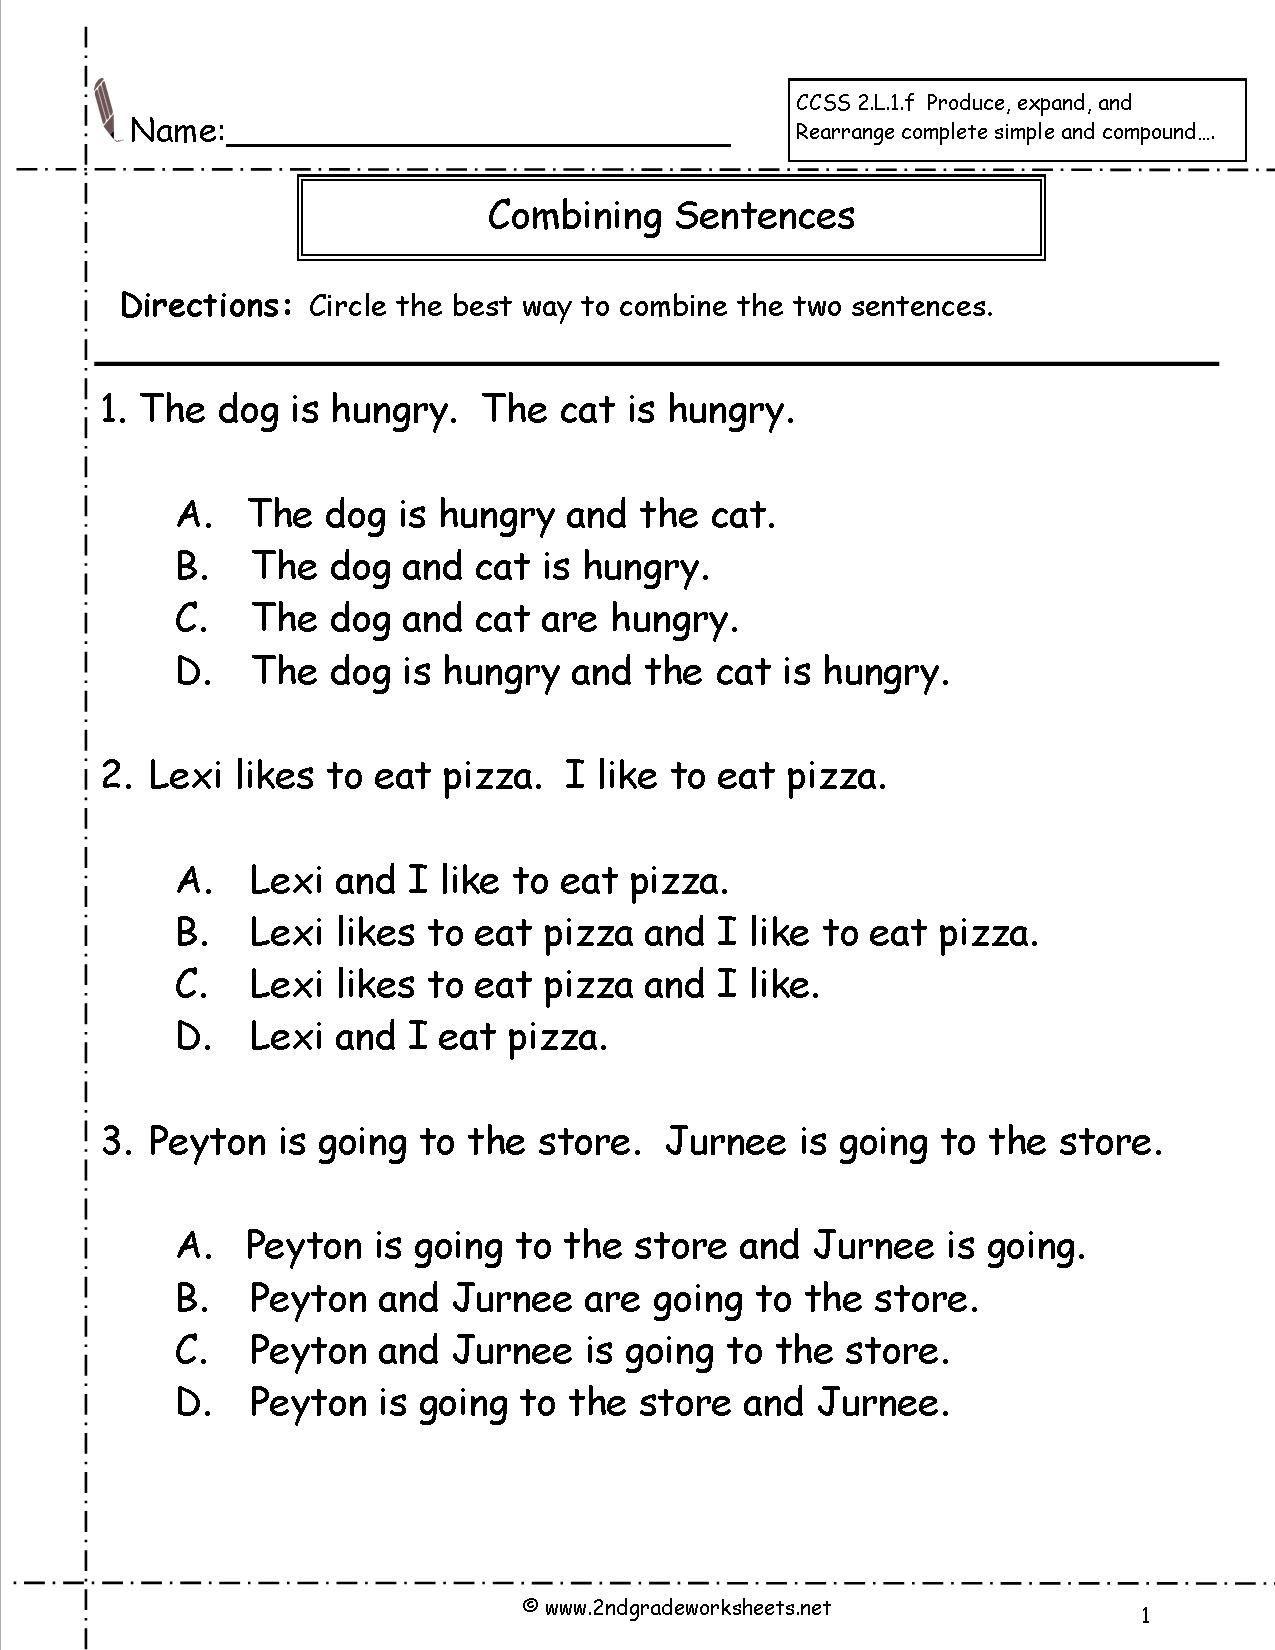 Topic Sentence Worksheets 2nd Grade Bining Sentences Worksheet with Images